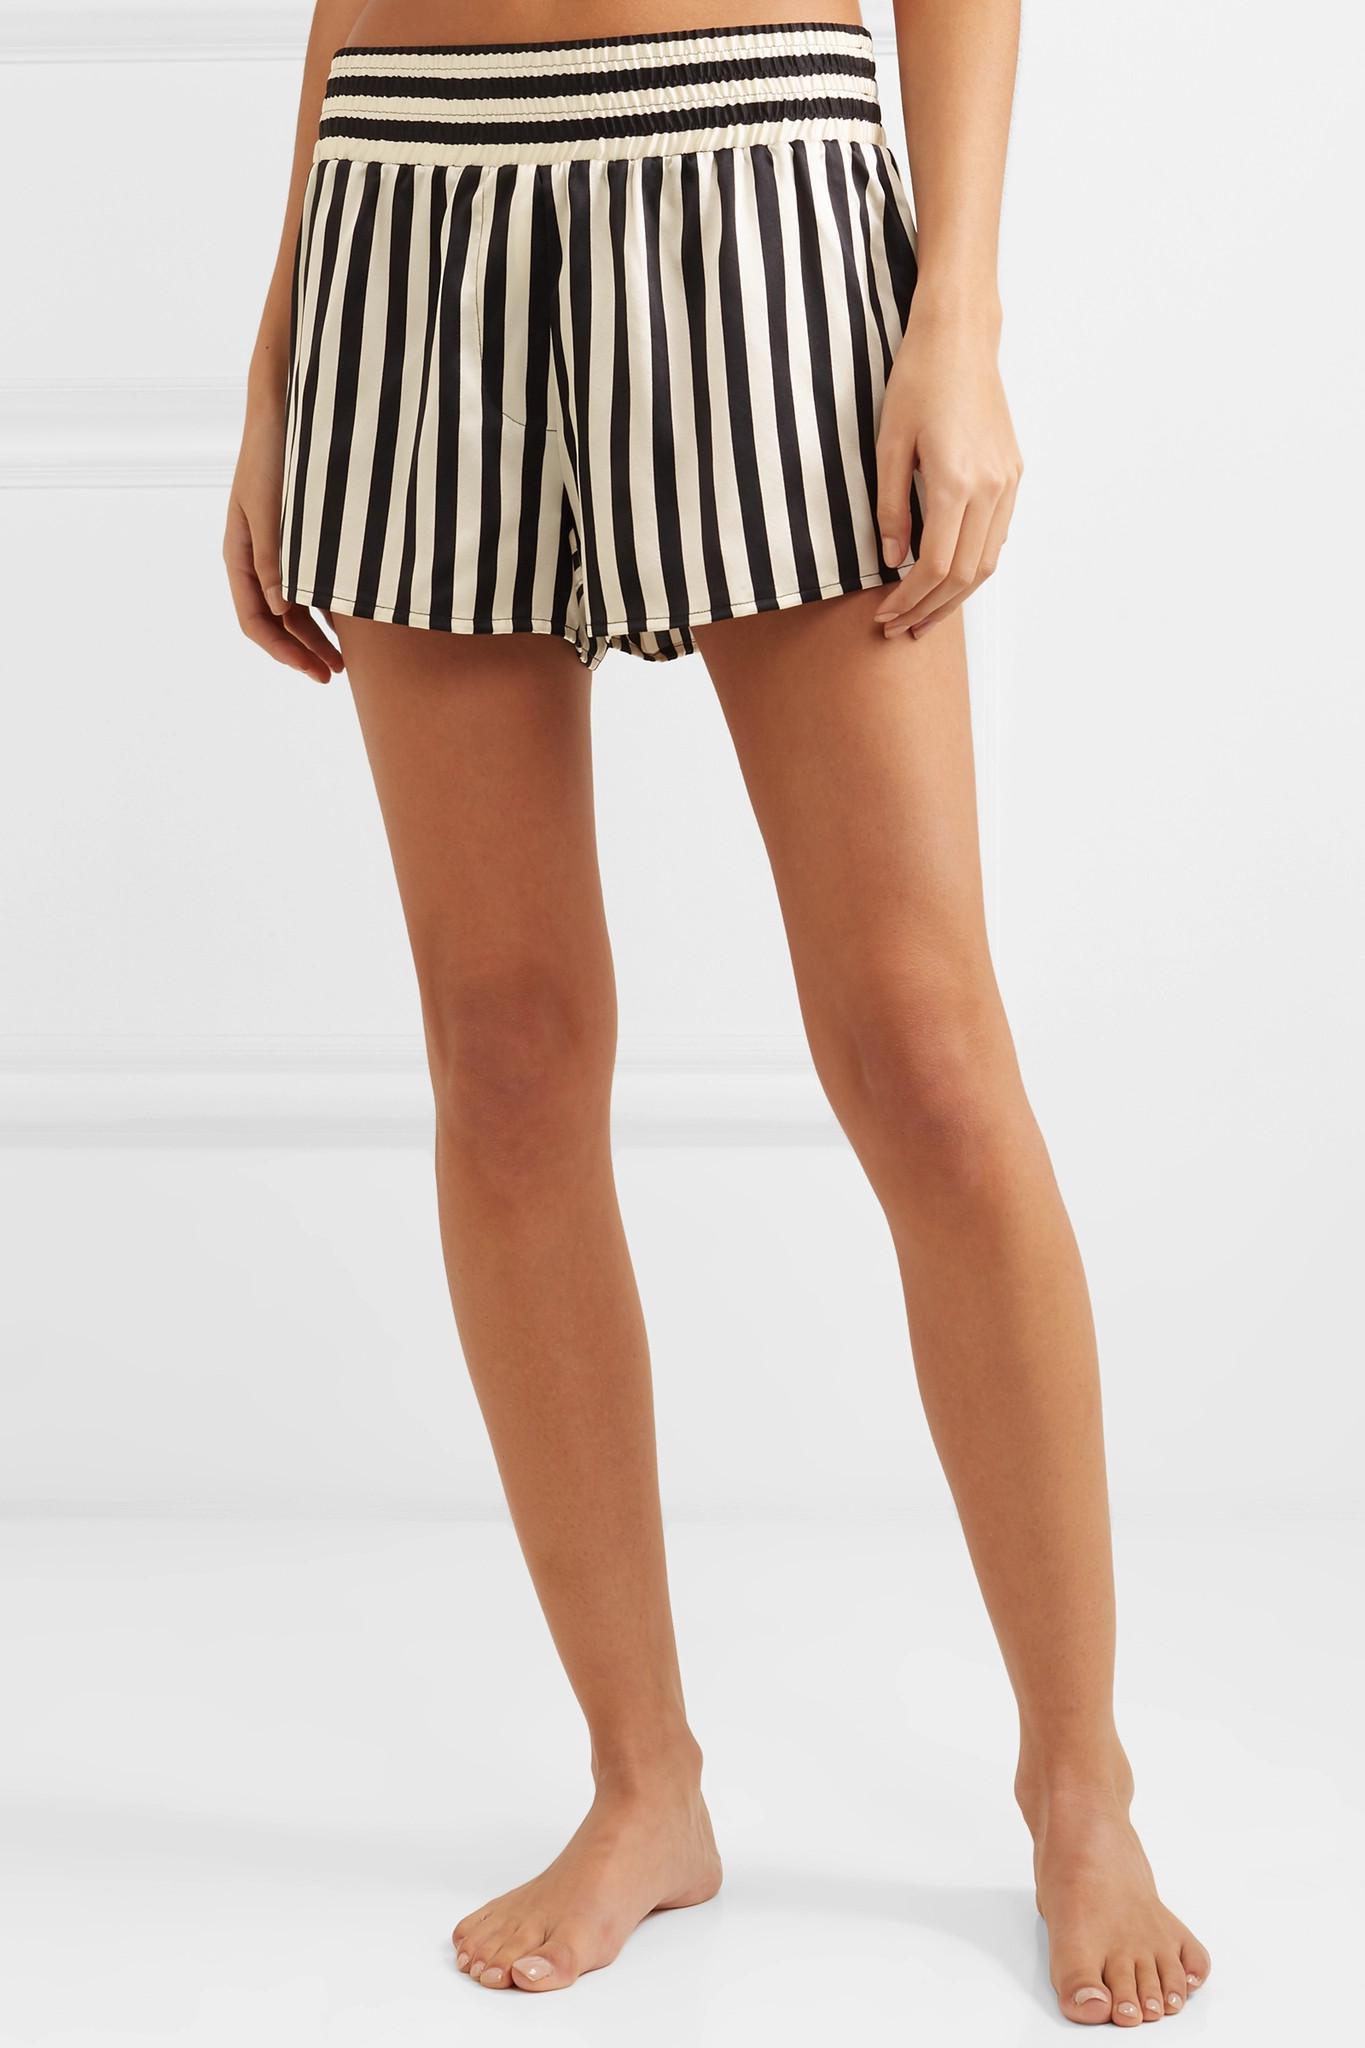 Morgan Lane - Black + Amanda Fatherazi Corey Appliquéd Striped Silk-charmeuse  Pajama Shorts -. View fullscreen 6e21fbd9d